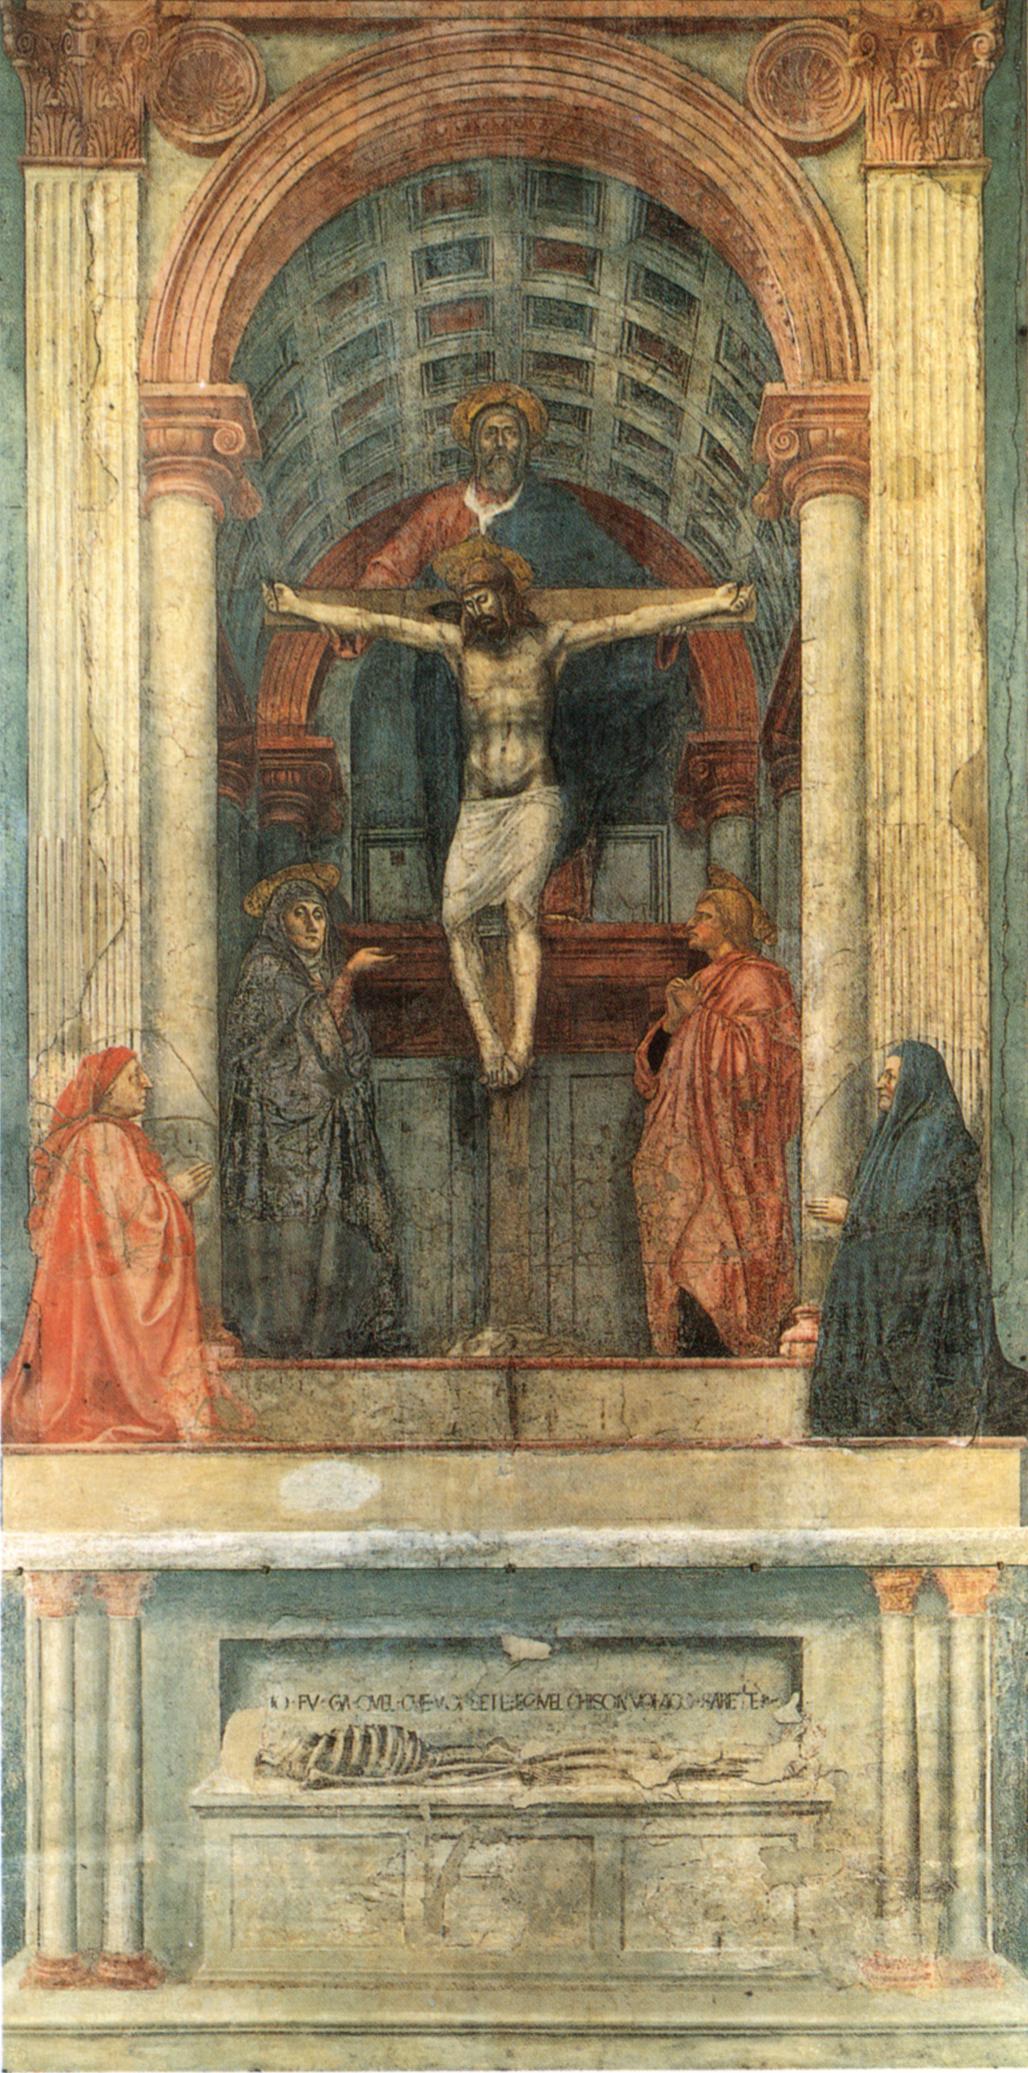 the life of tommaso masaccio essay Analysis of andrea del castagno's last supper early life of the artist born in 1419 and fresco artist influenced primarily by tommaso masaccio and giotto.